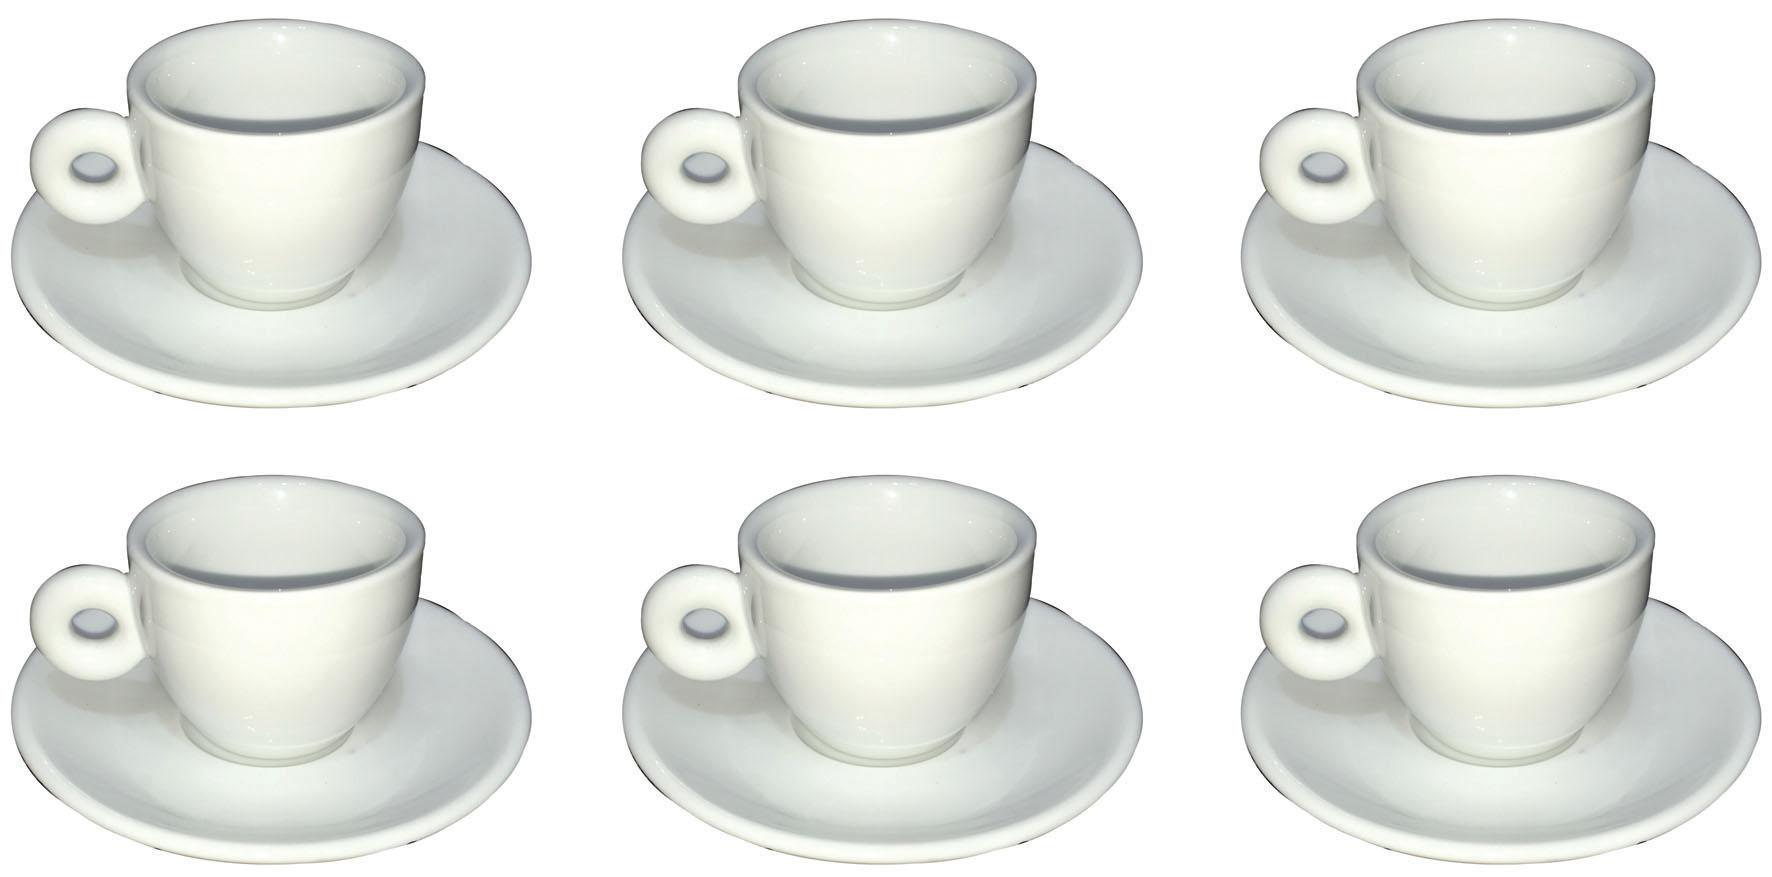 SERV CAFFE  PZ 6 C P LAURA3